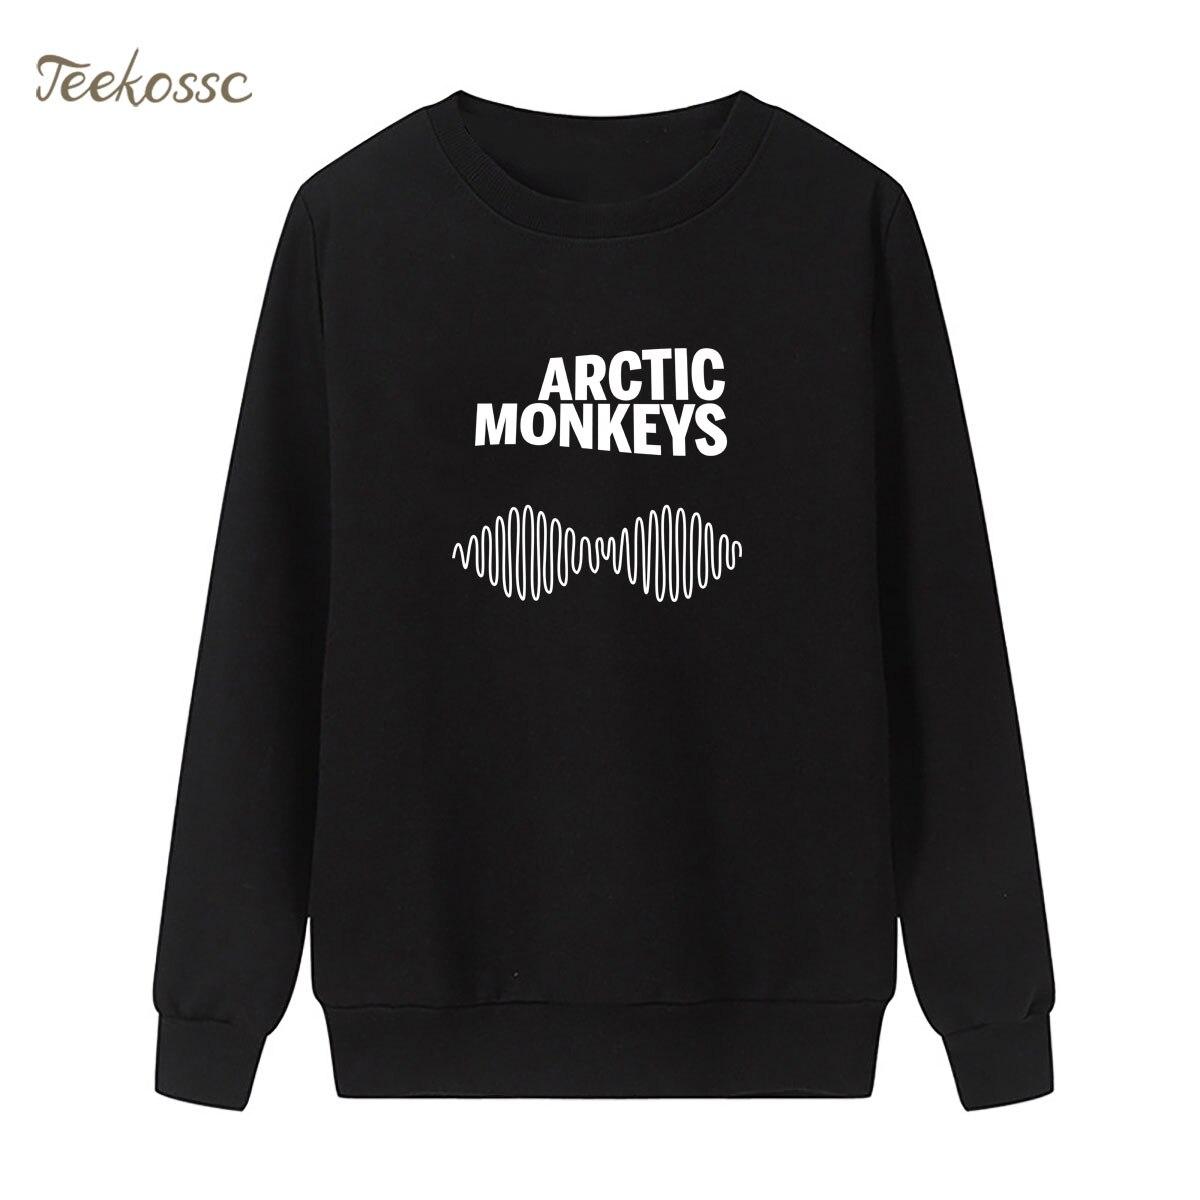 Black Sweatshirt Casual Hoodie 2018 Winter Autumn Women Lasdies Pullover Loose Fleece Round Neck Female New Fashion Streetwear